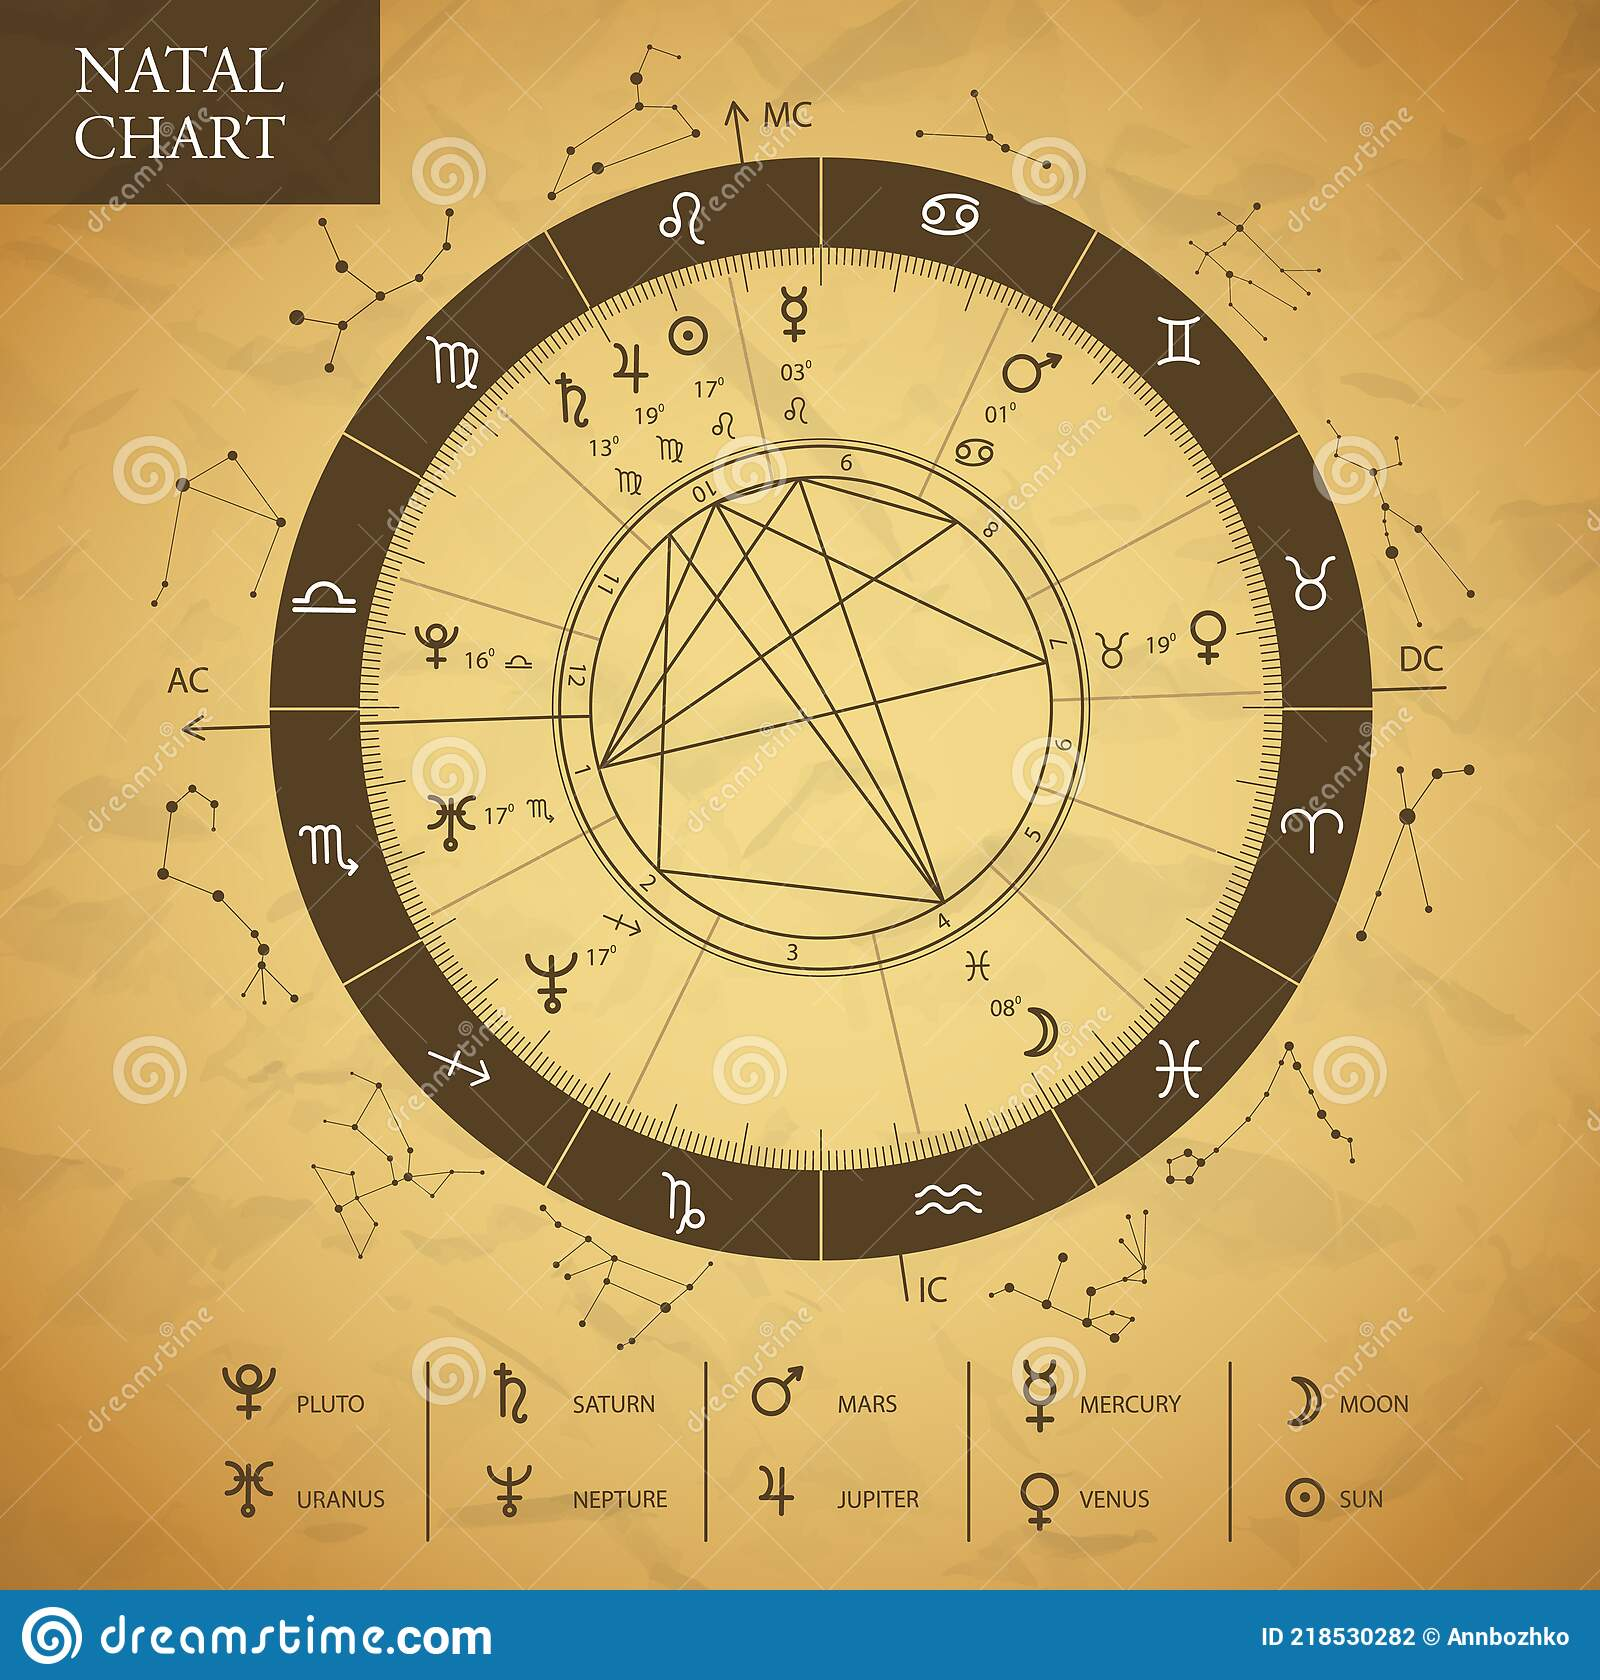 Natal Chart Stock Illustrations – 20 Natal Chart Stock ...